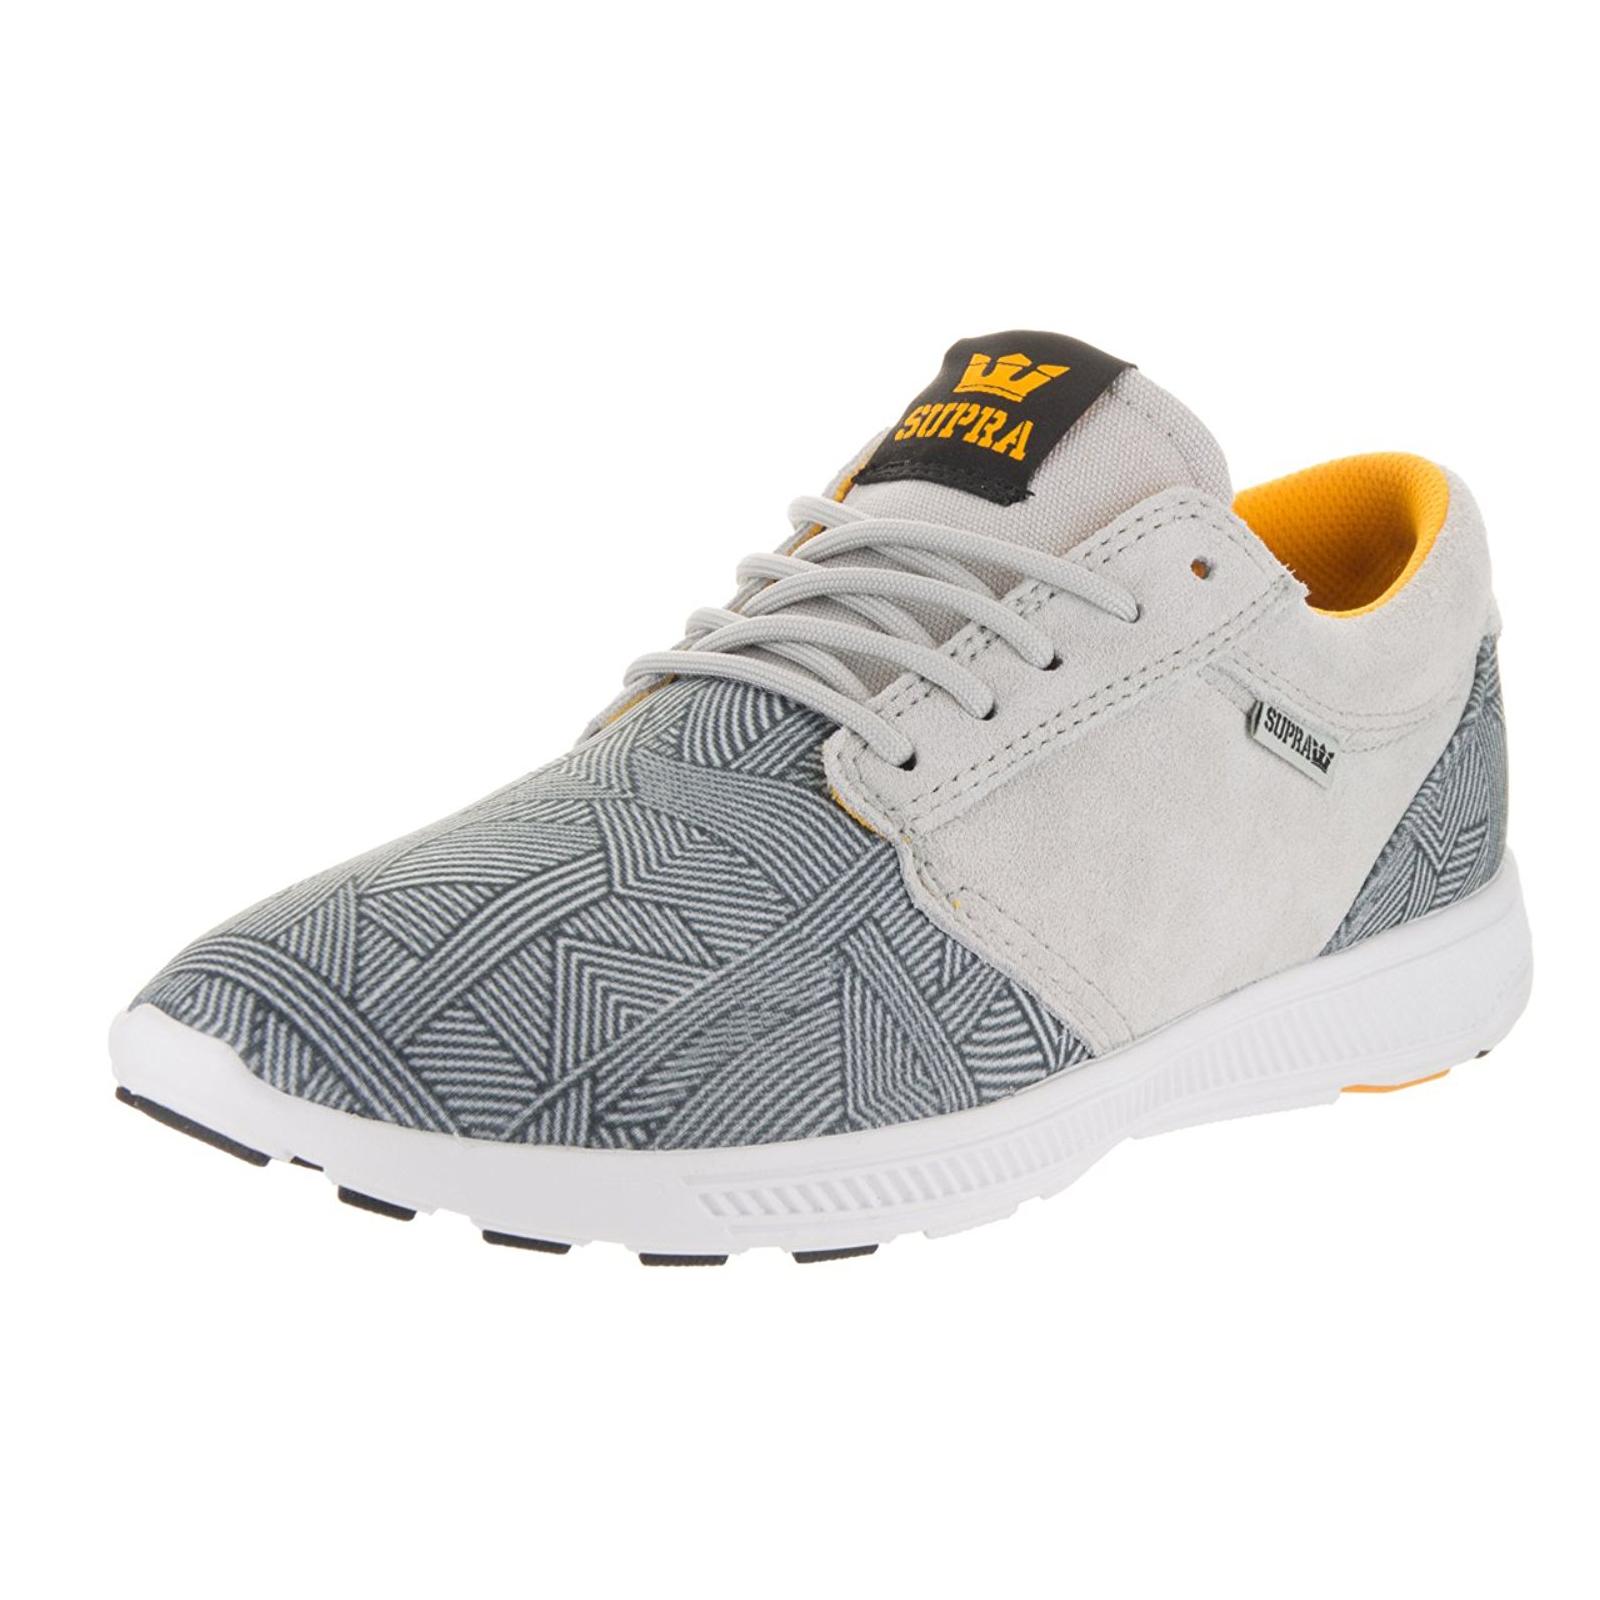 Supra Sneakers Hammer Run-Greypurple Print-White Grv grey